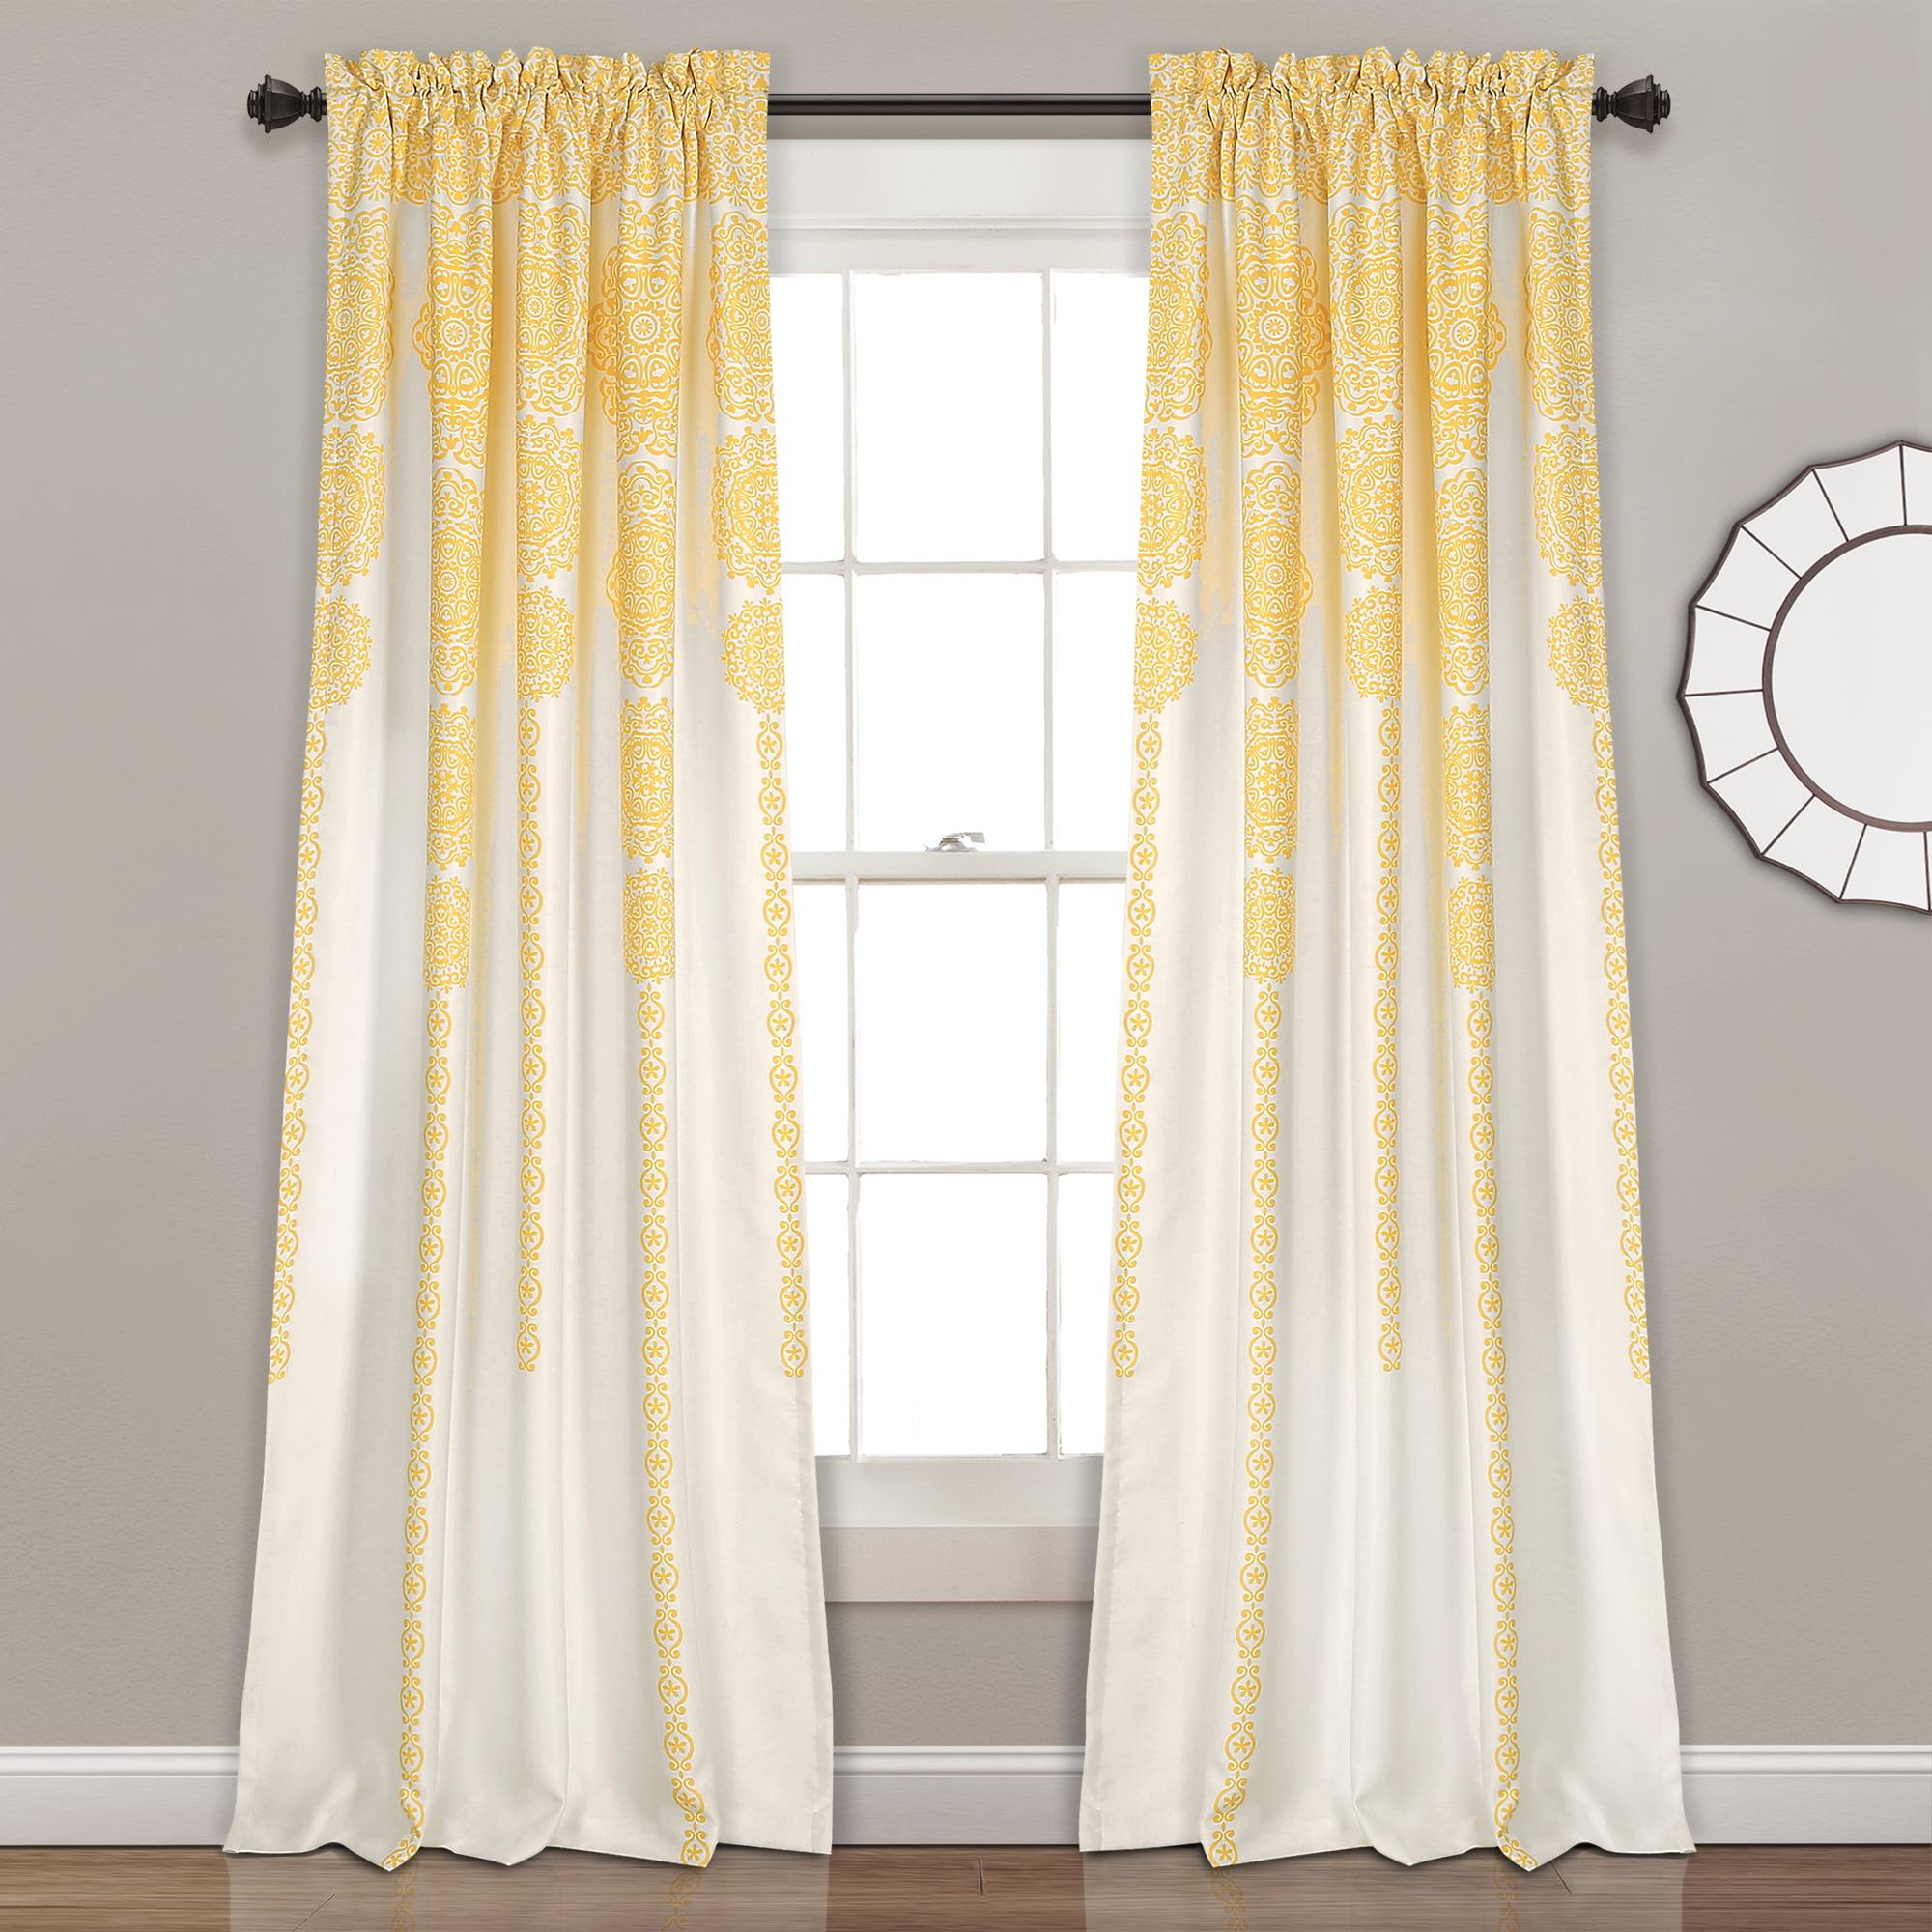 Stripe Medallion Room Darkening Window Curtain Panels Yellow 52x84+2 Set